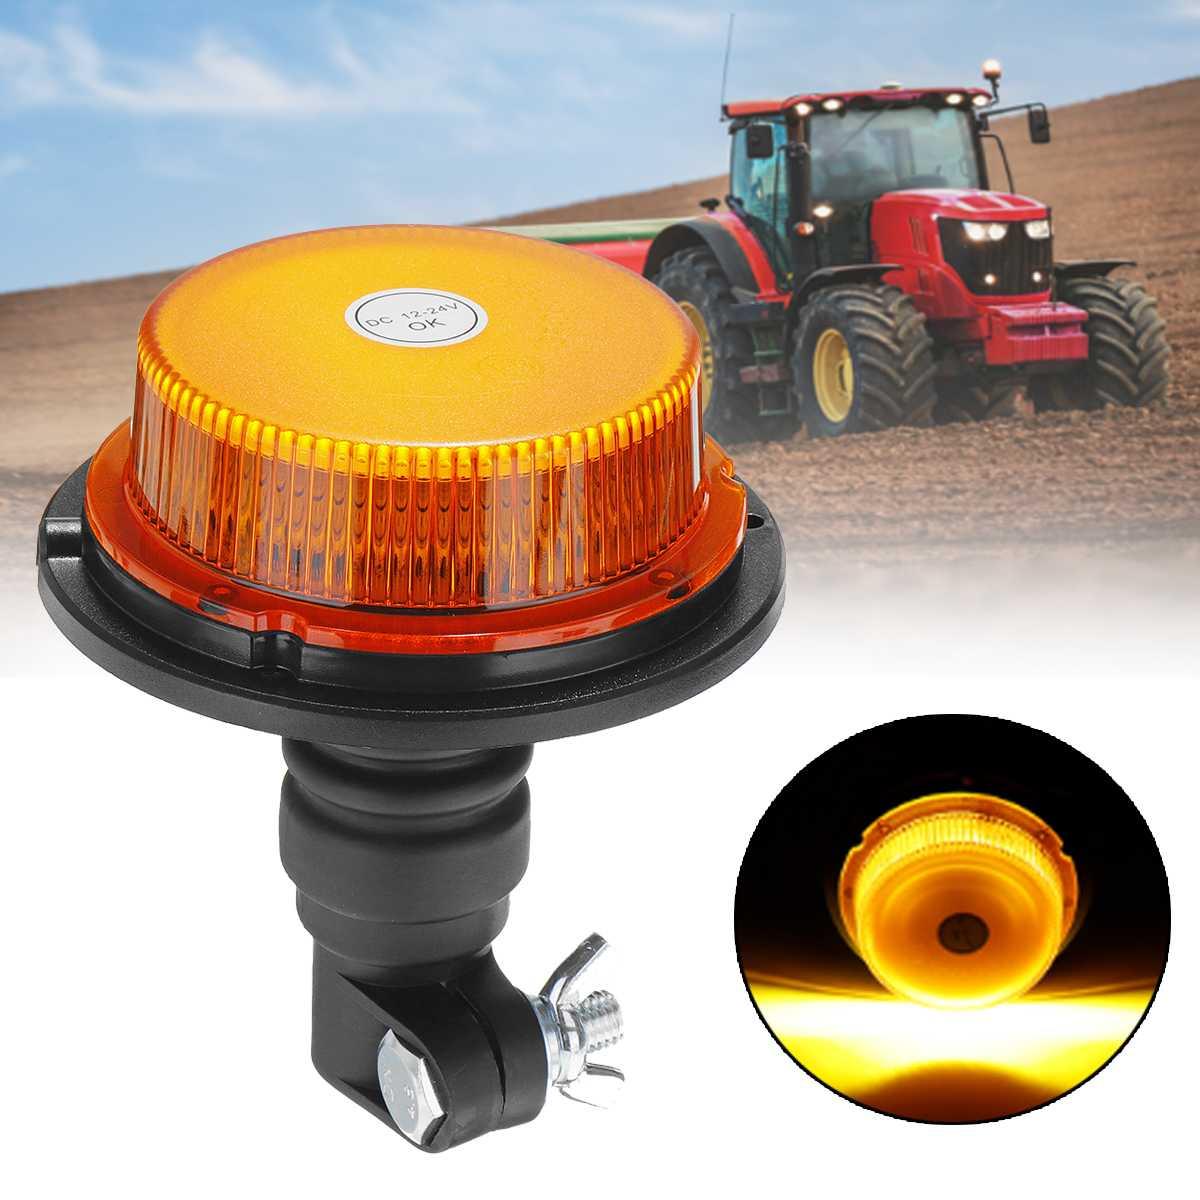 Flashing LED Amber Beacon Mount DIN Pole Bracket Tractor Mounting Holder Weld on